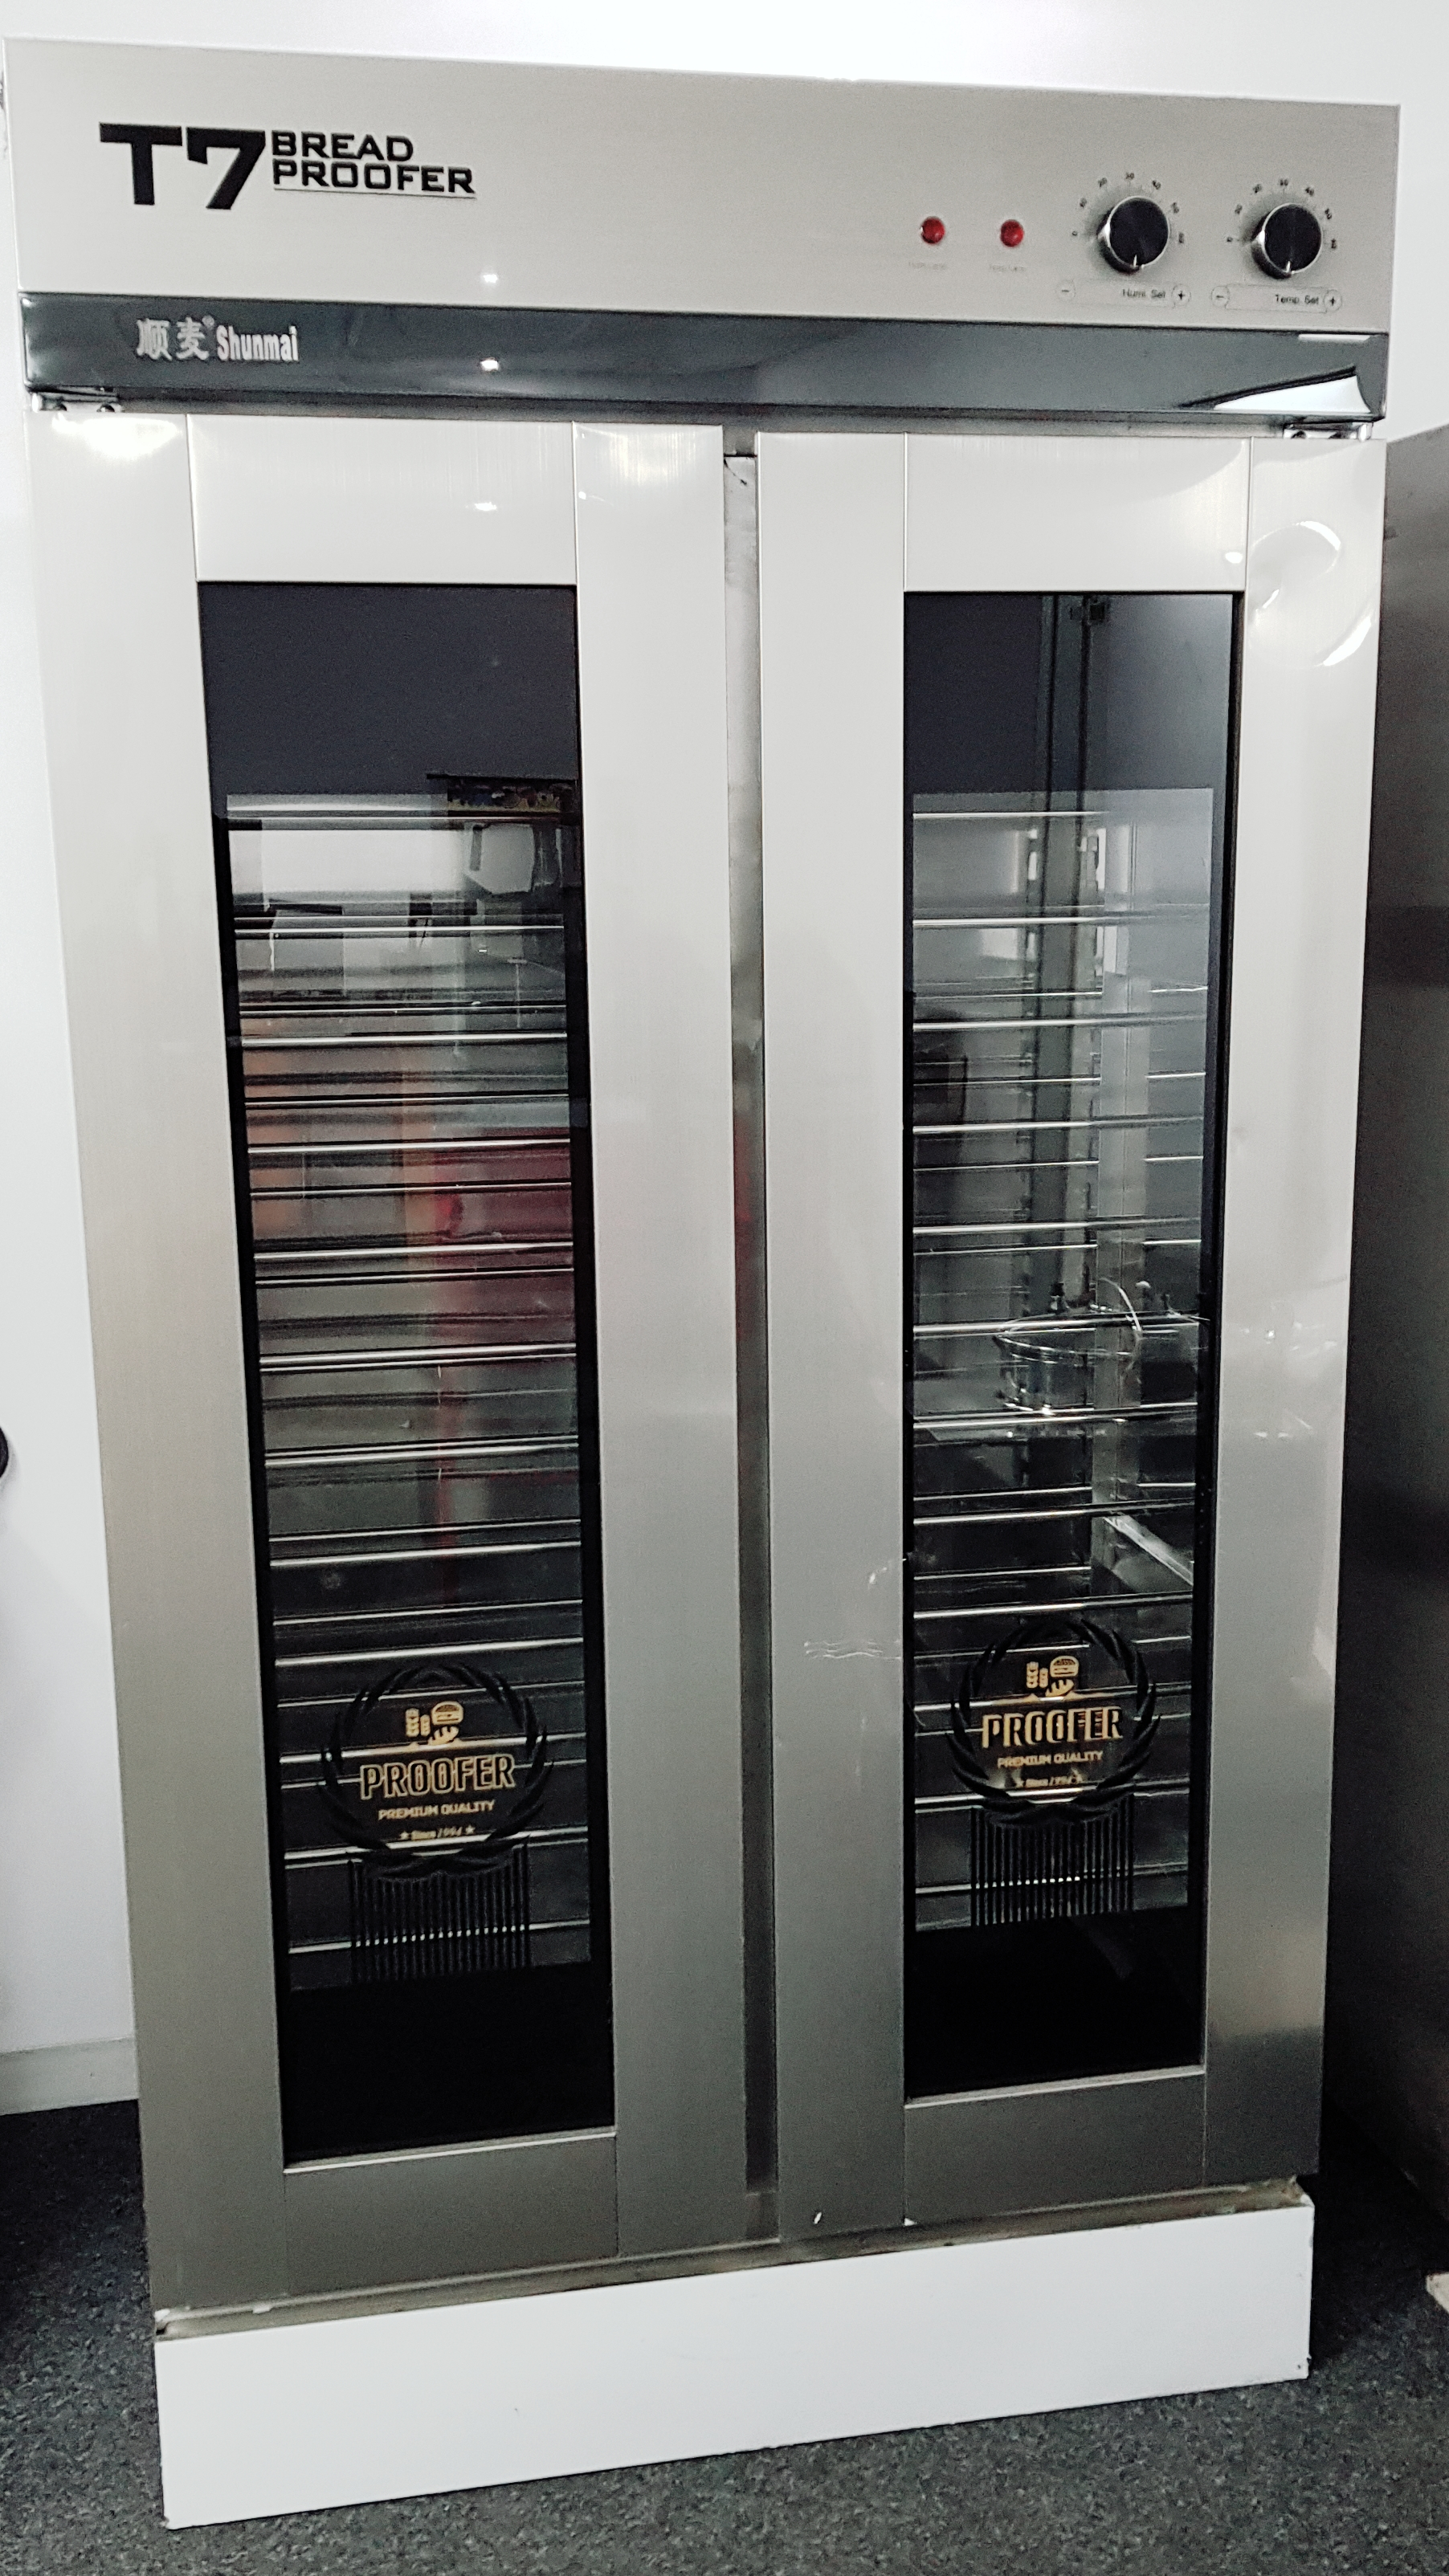 Proofer Bread Proofer Proofer Oven Proofing Oven Baking Prover Ovens For Sale Sunrose Online Jhb Commercial Bakery Butchery Catering Refrigeration Equipment